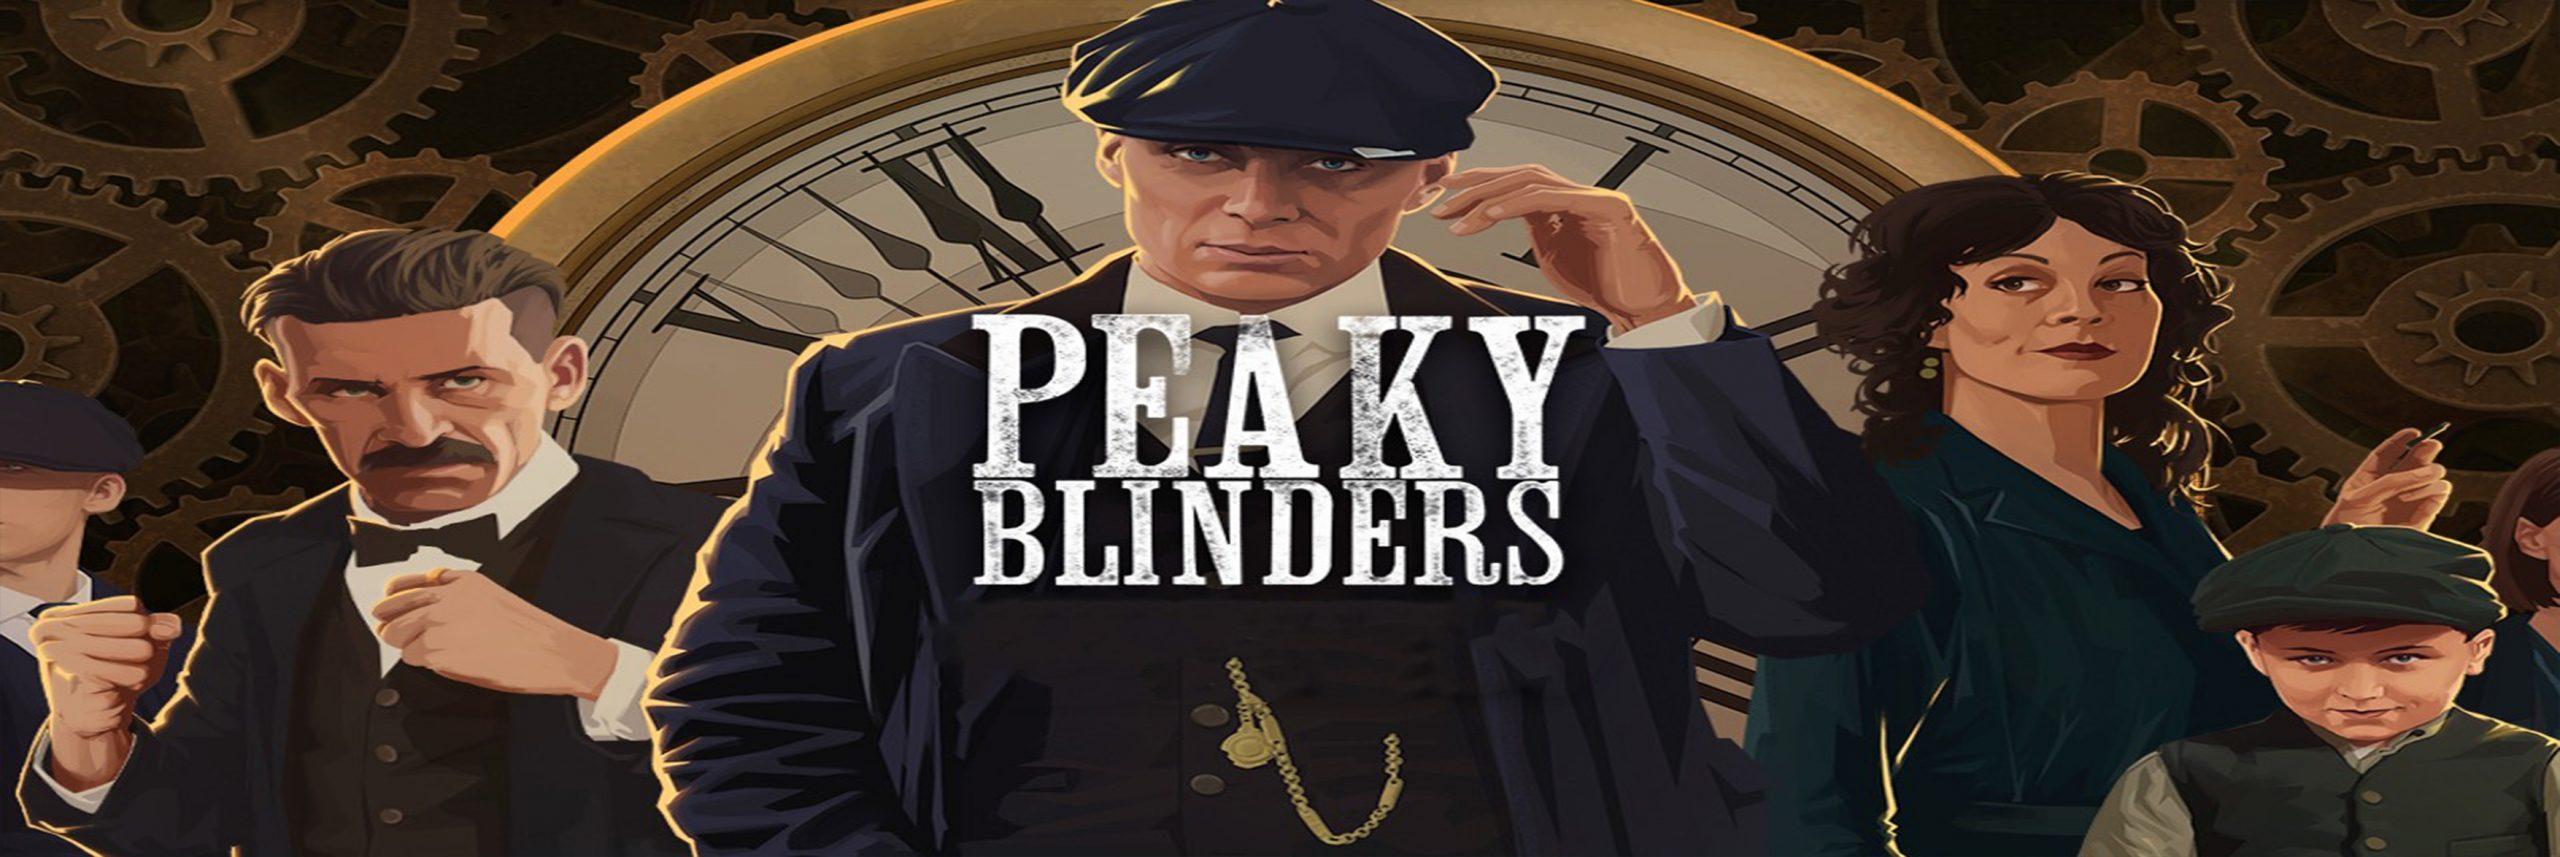 نقابداران – Peaky Blinders